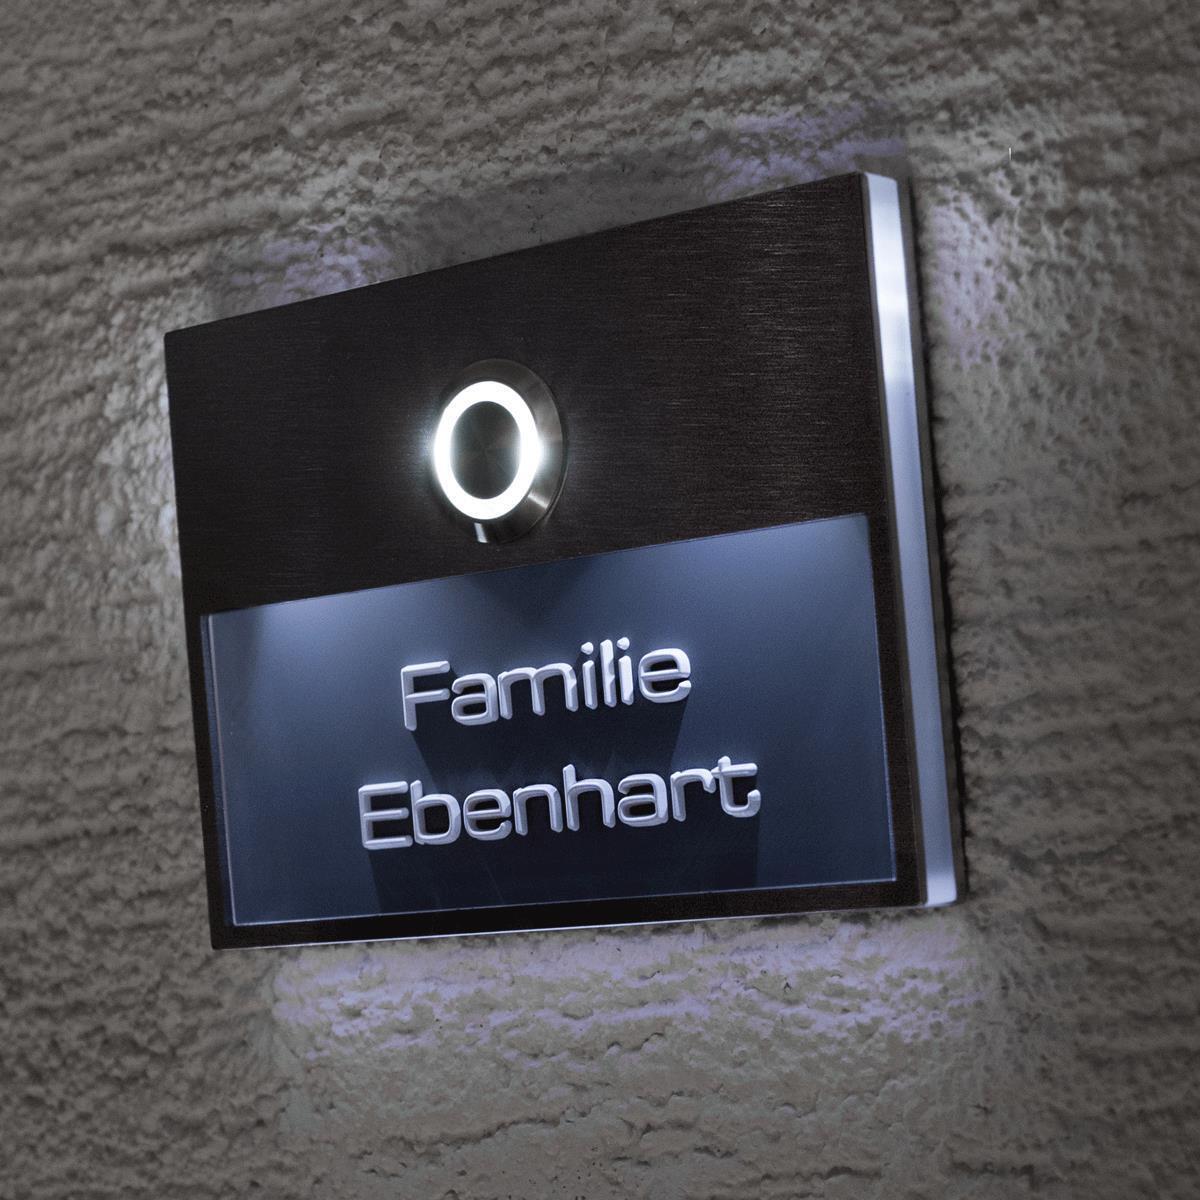 Türklingel Edelstahl Klingelschild LED-Klingeltaster Haustürklingel Beleuchtet